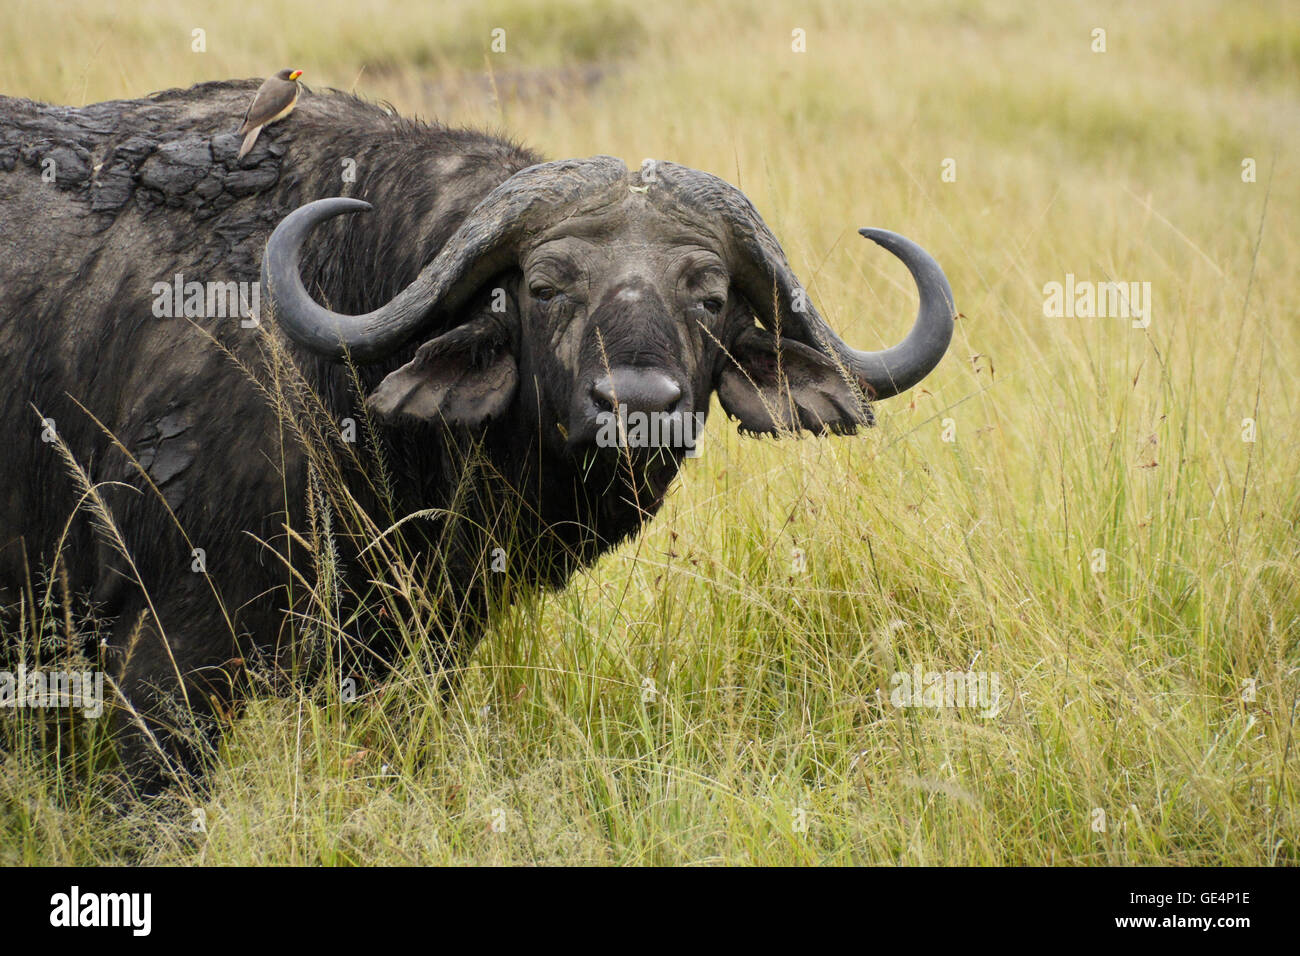 Cape buffalo with yellow-billed oxpecker in long grass, Masai Mara, Kenya - Stock Image